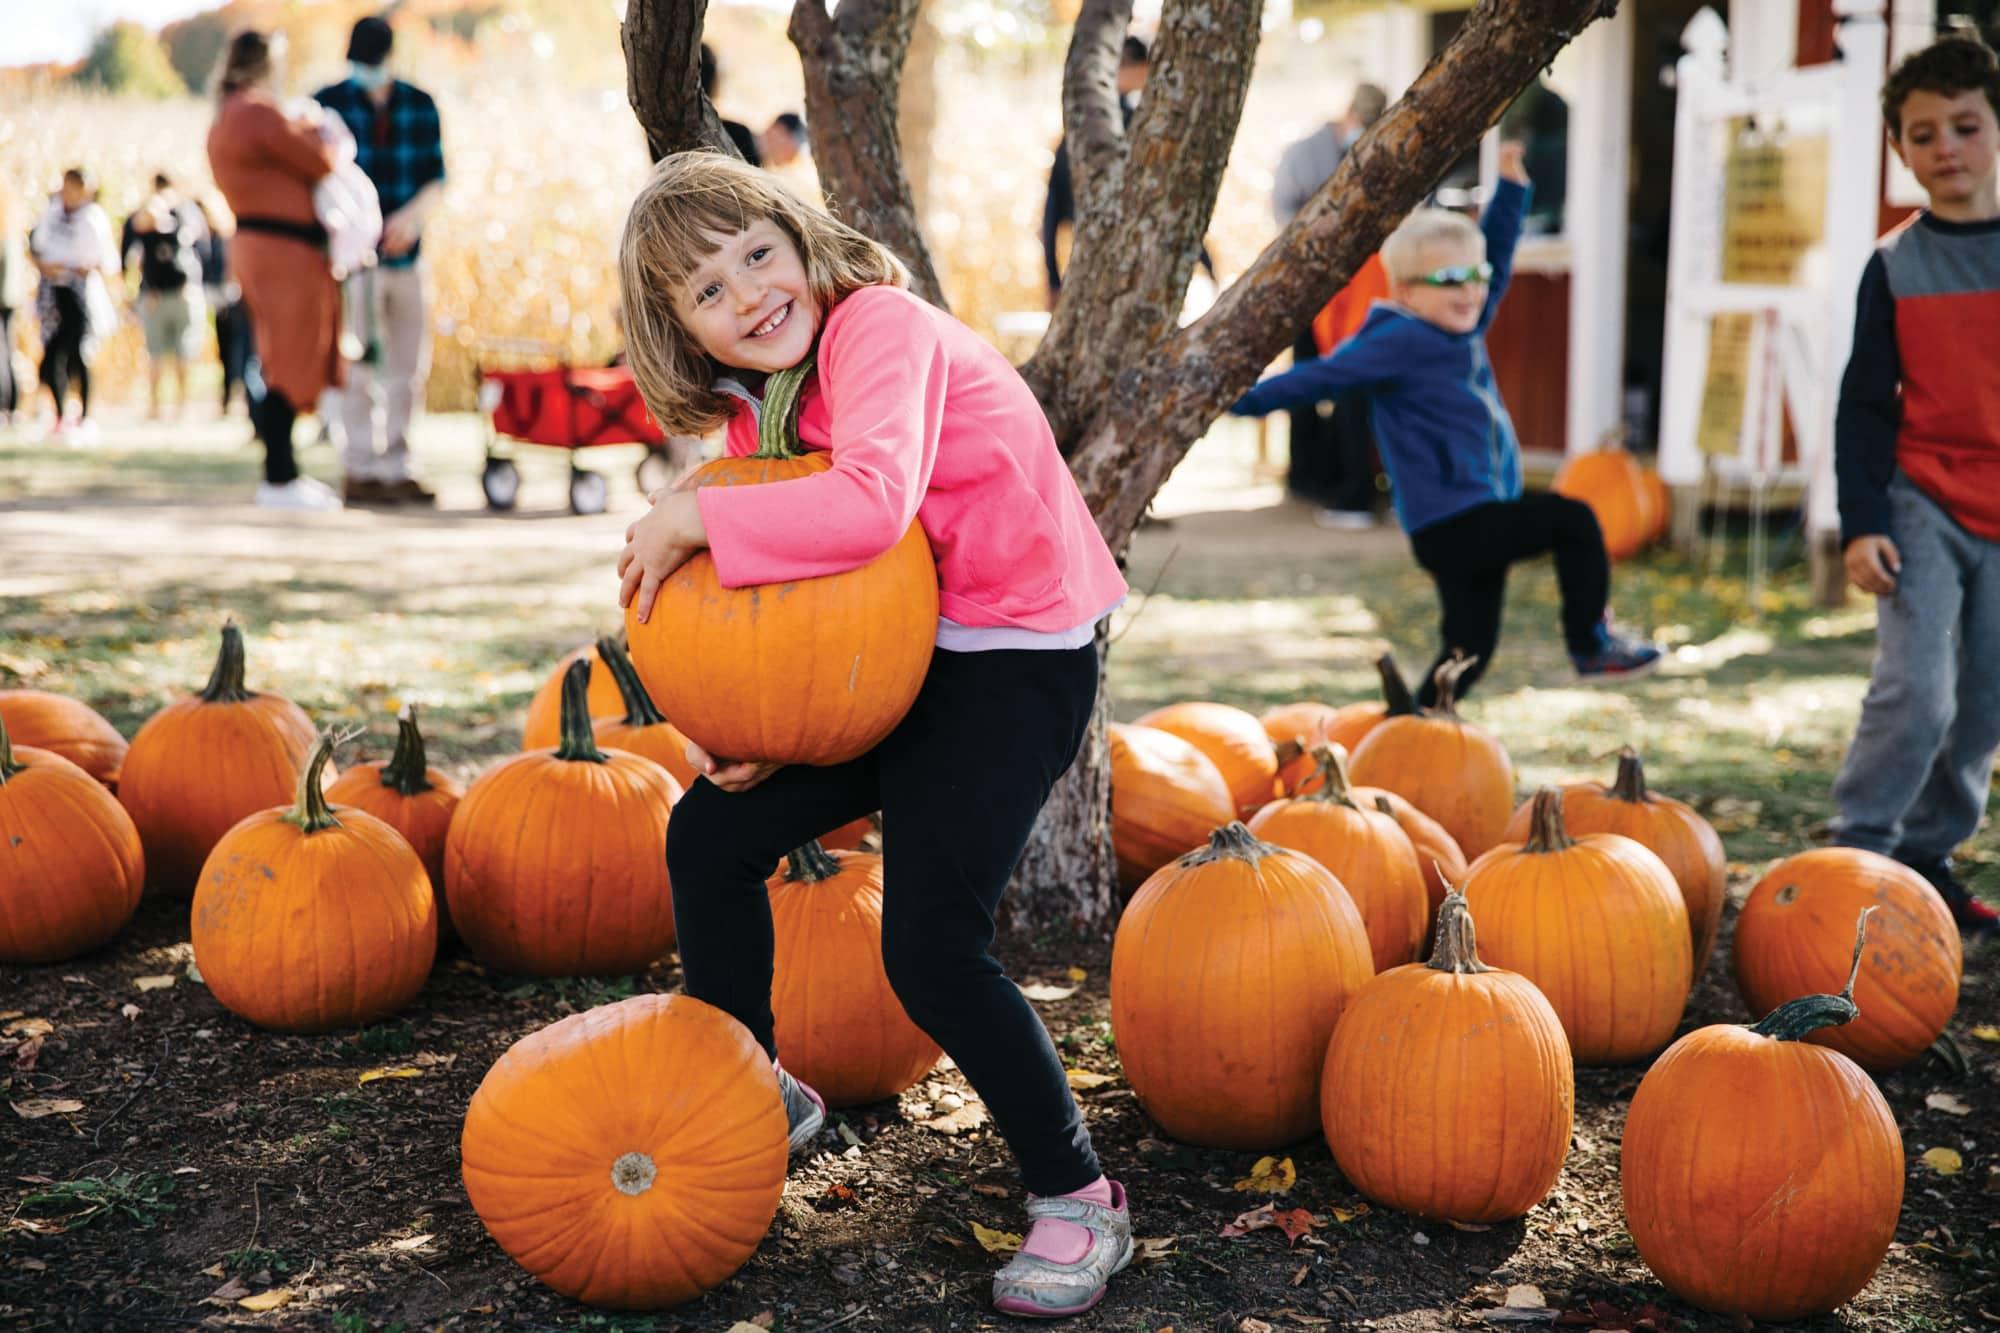 Girl with pumpkins at Jacob's Farm